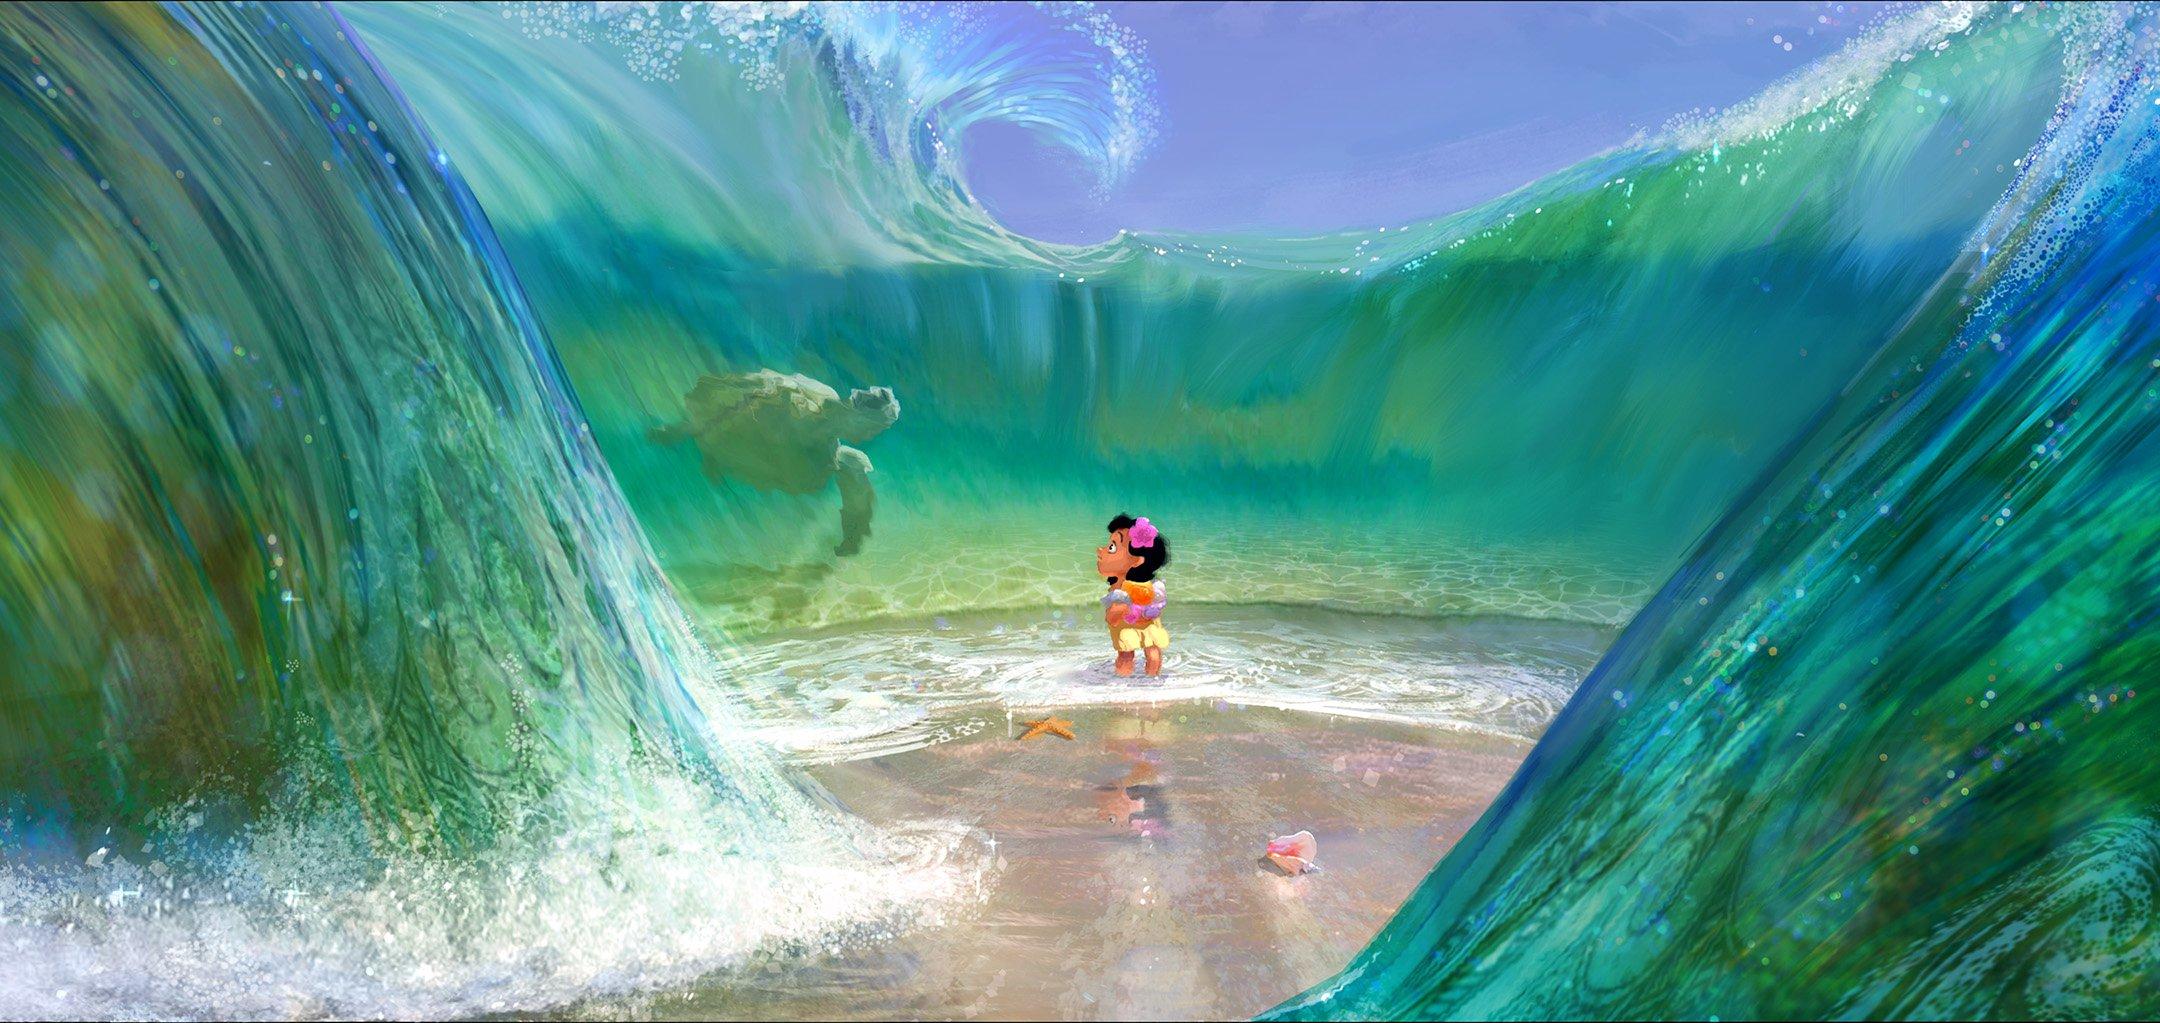 Moana, 2016 Lisa Keene Concept art digital painting © Disney Enterprises